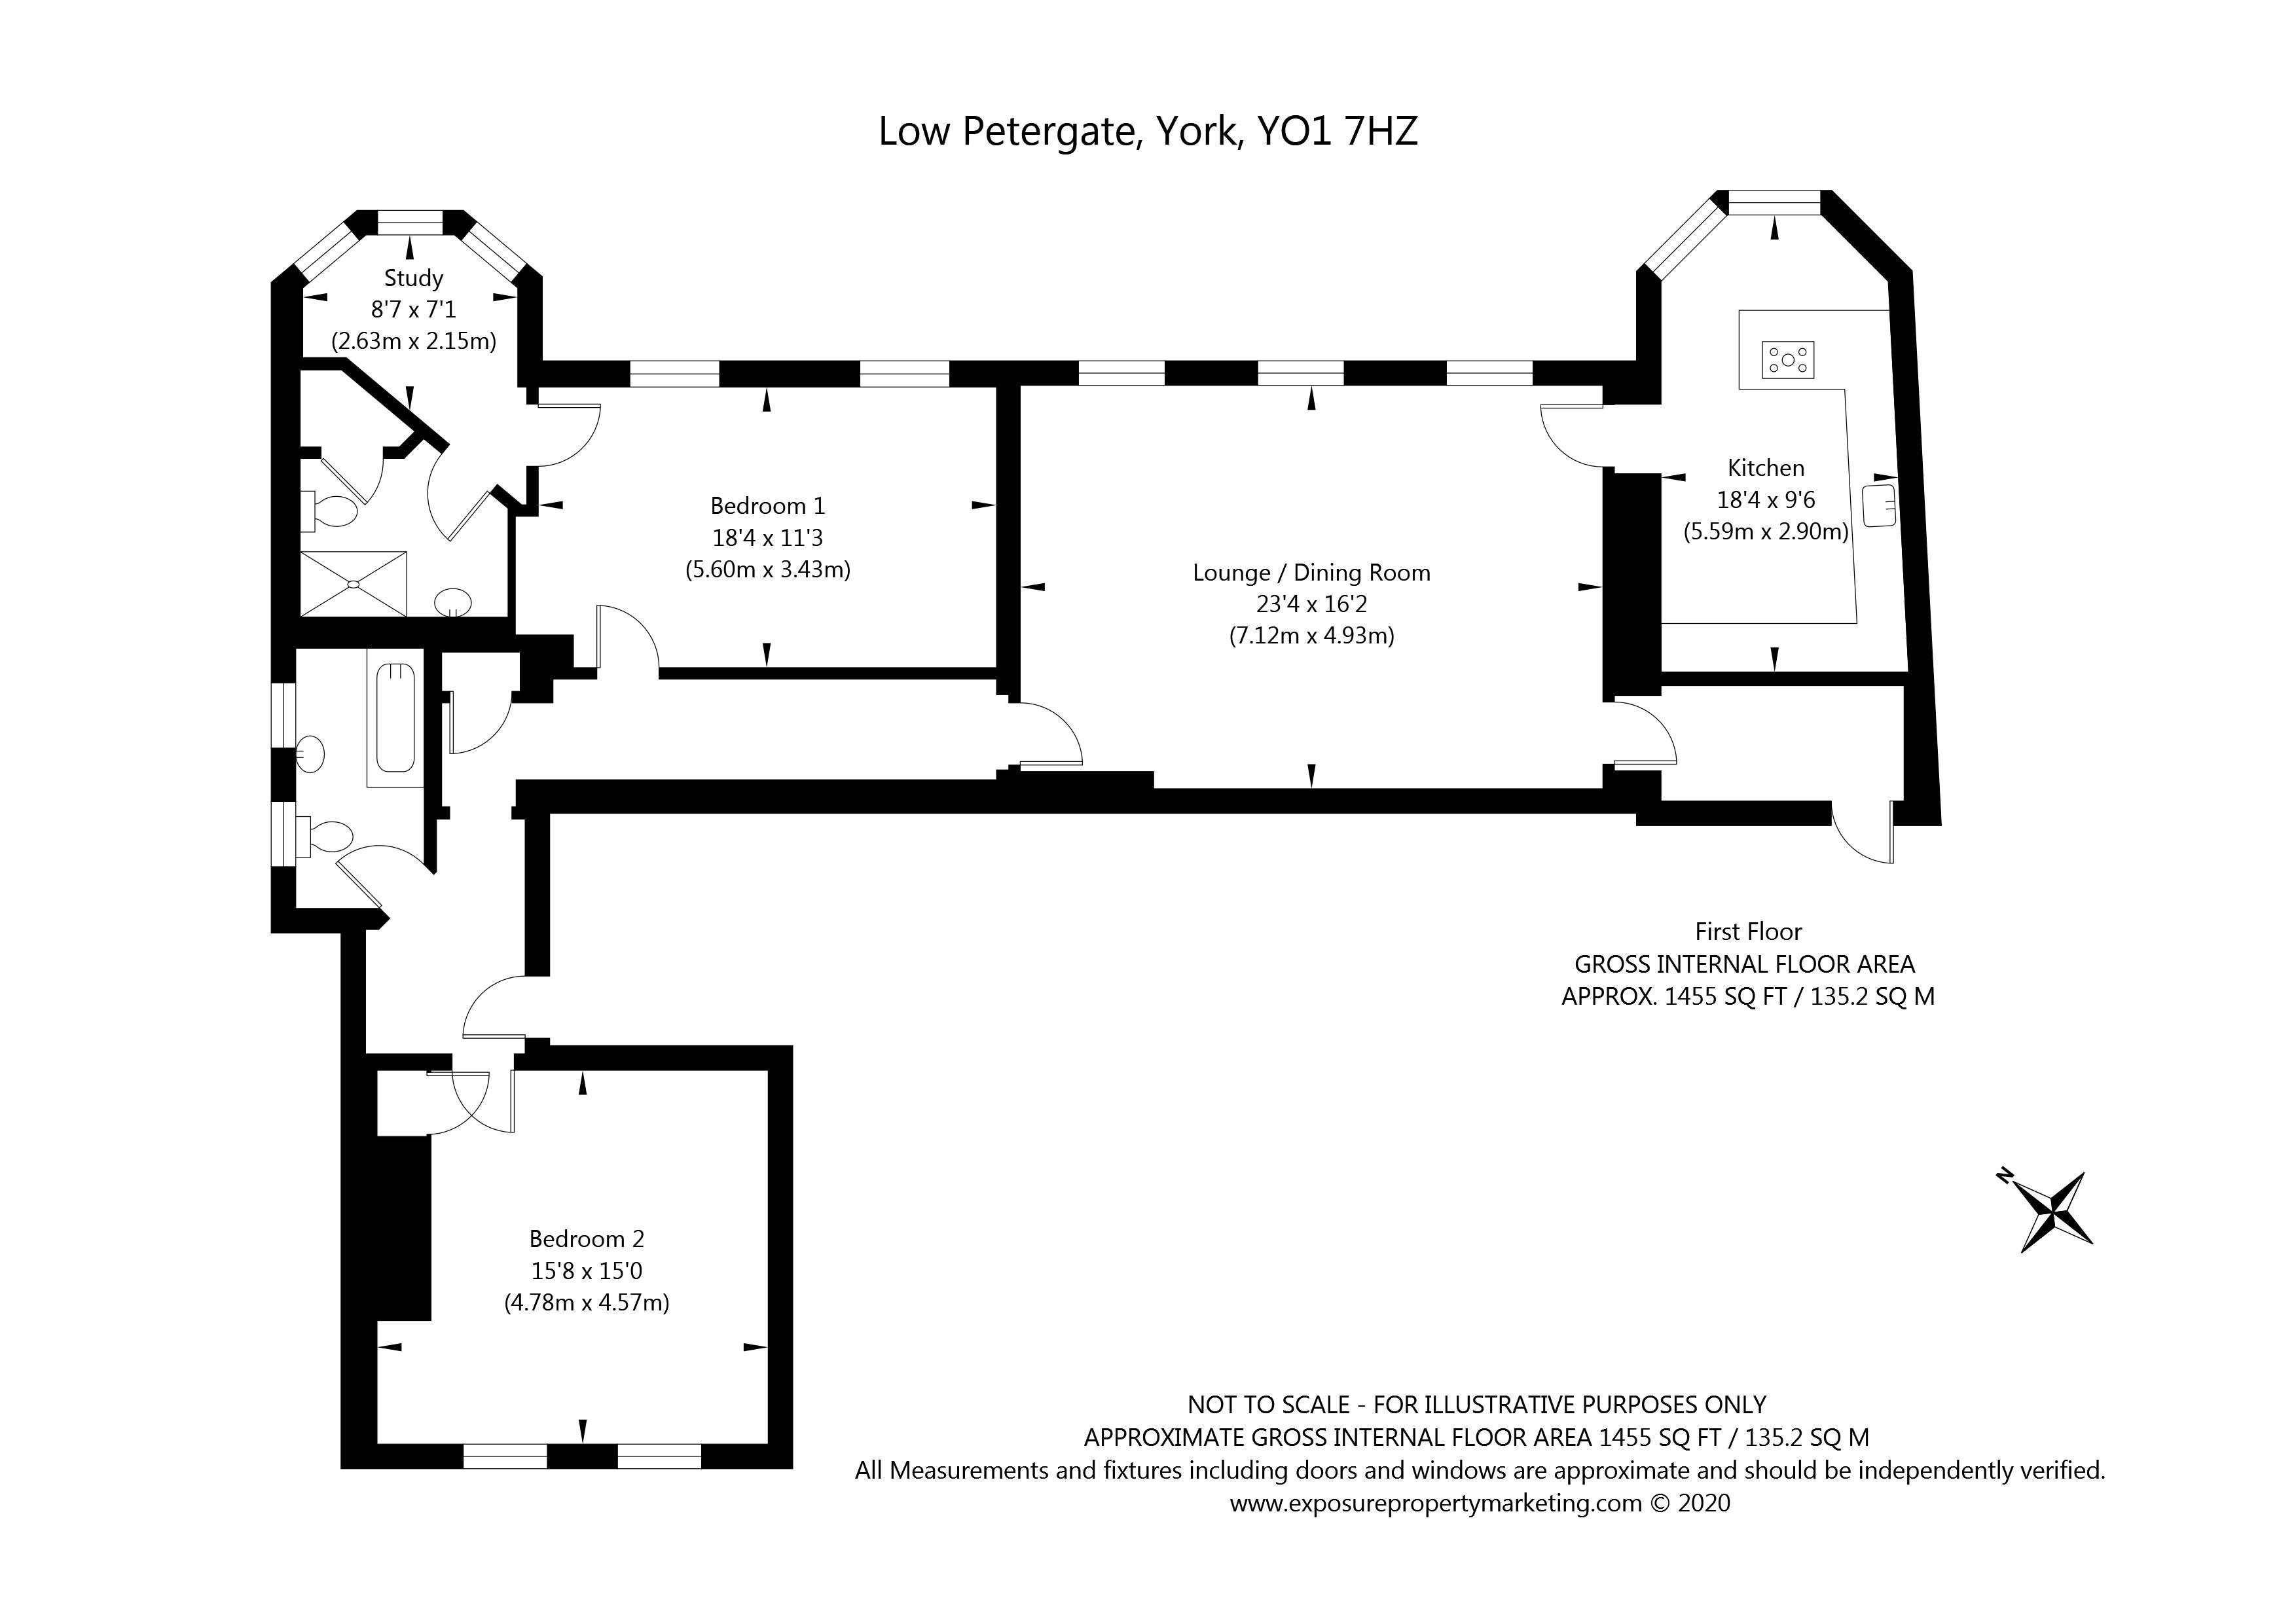 Low Petergate, York property floorplan